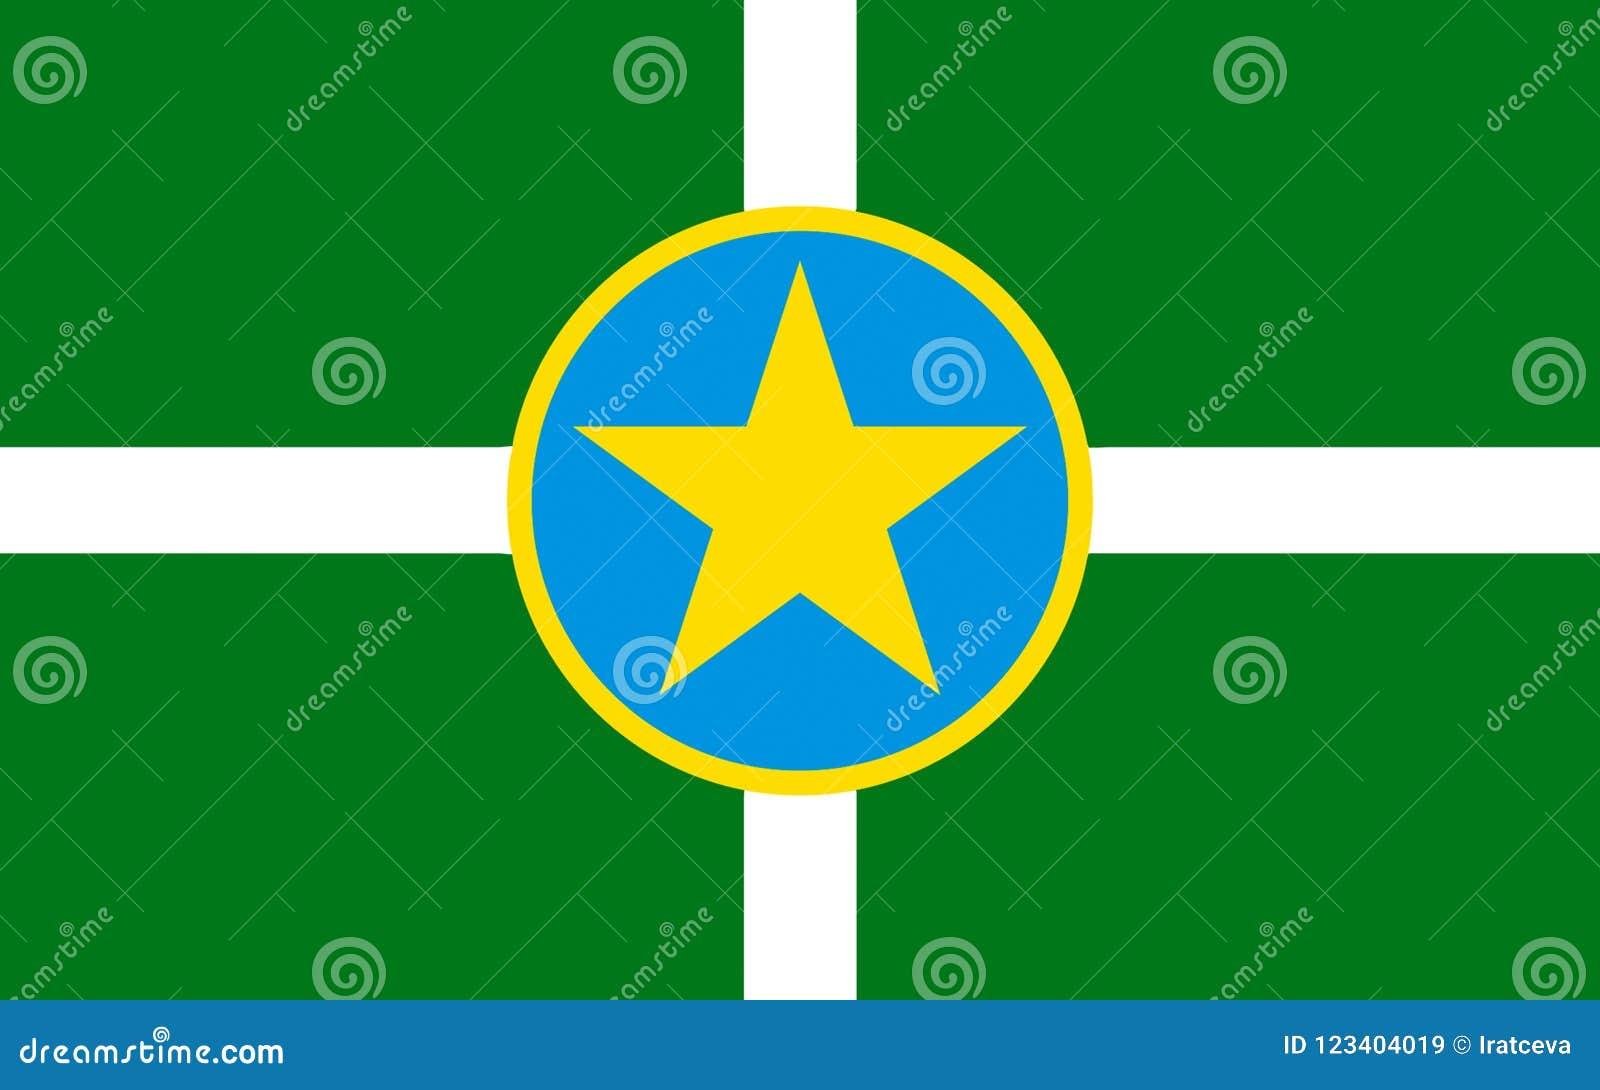 Flag of Jackson in Mississippi, USA